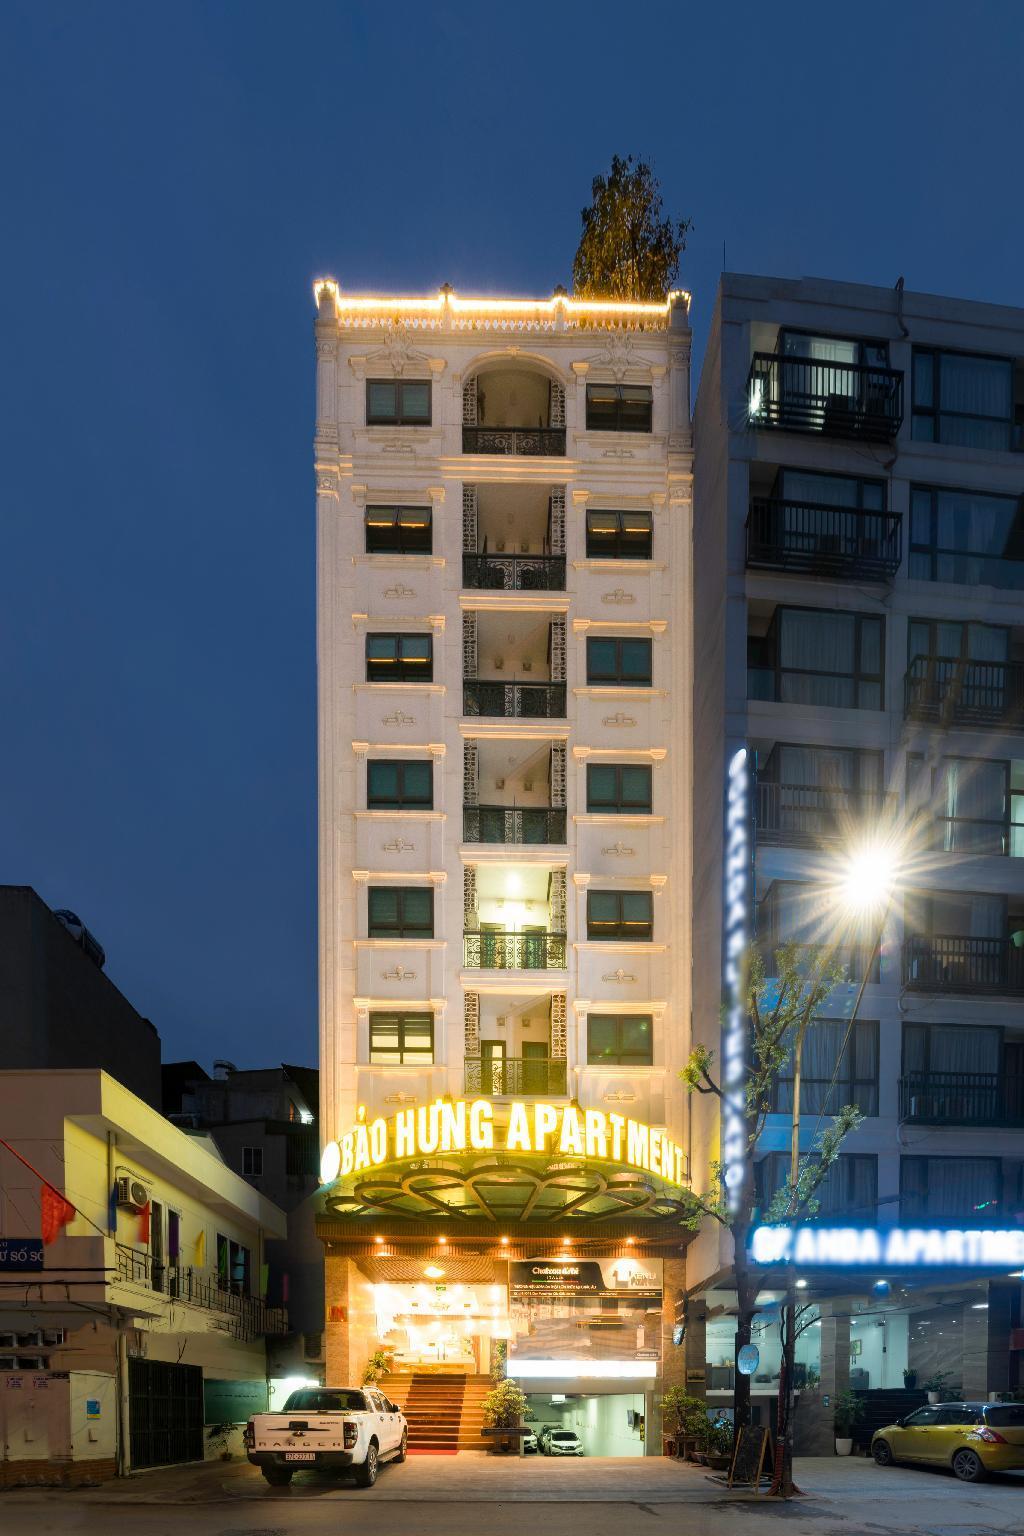 Bao Hung Hotel & Apartment, Cầu Giấy